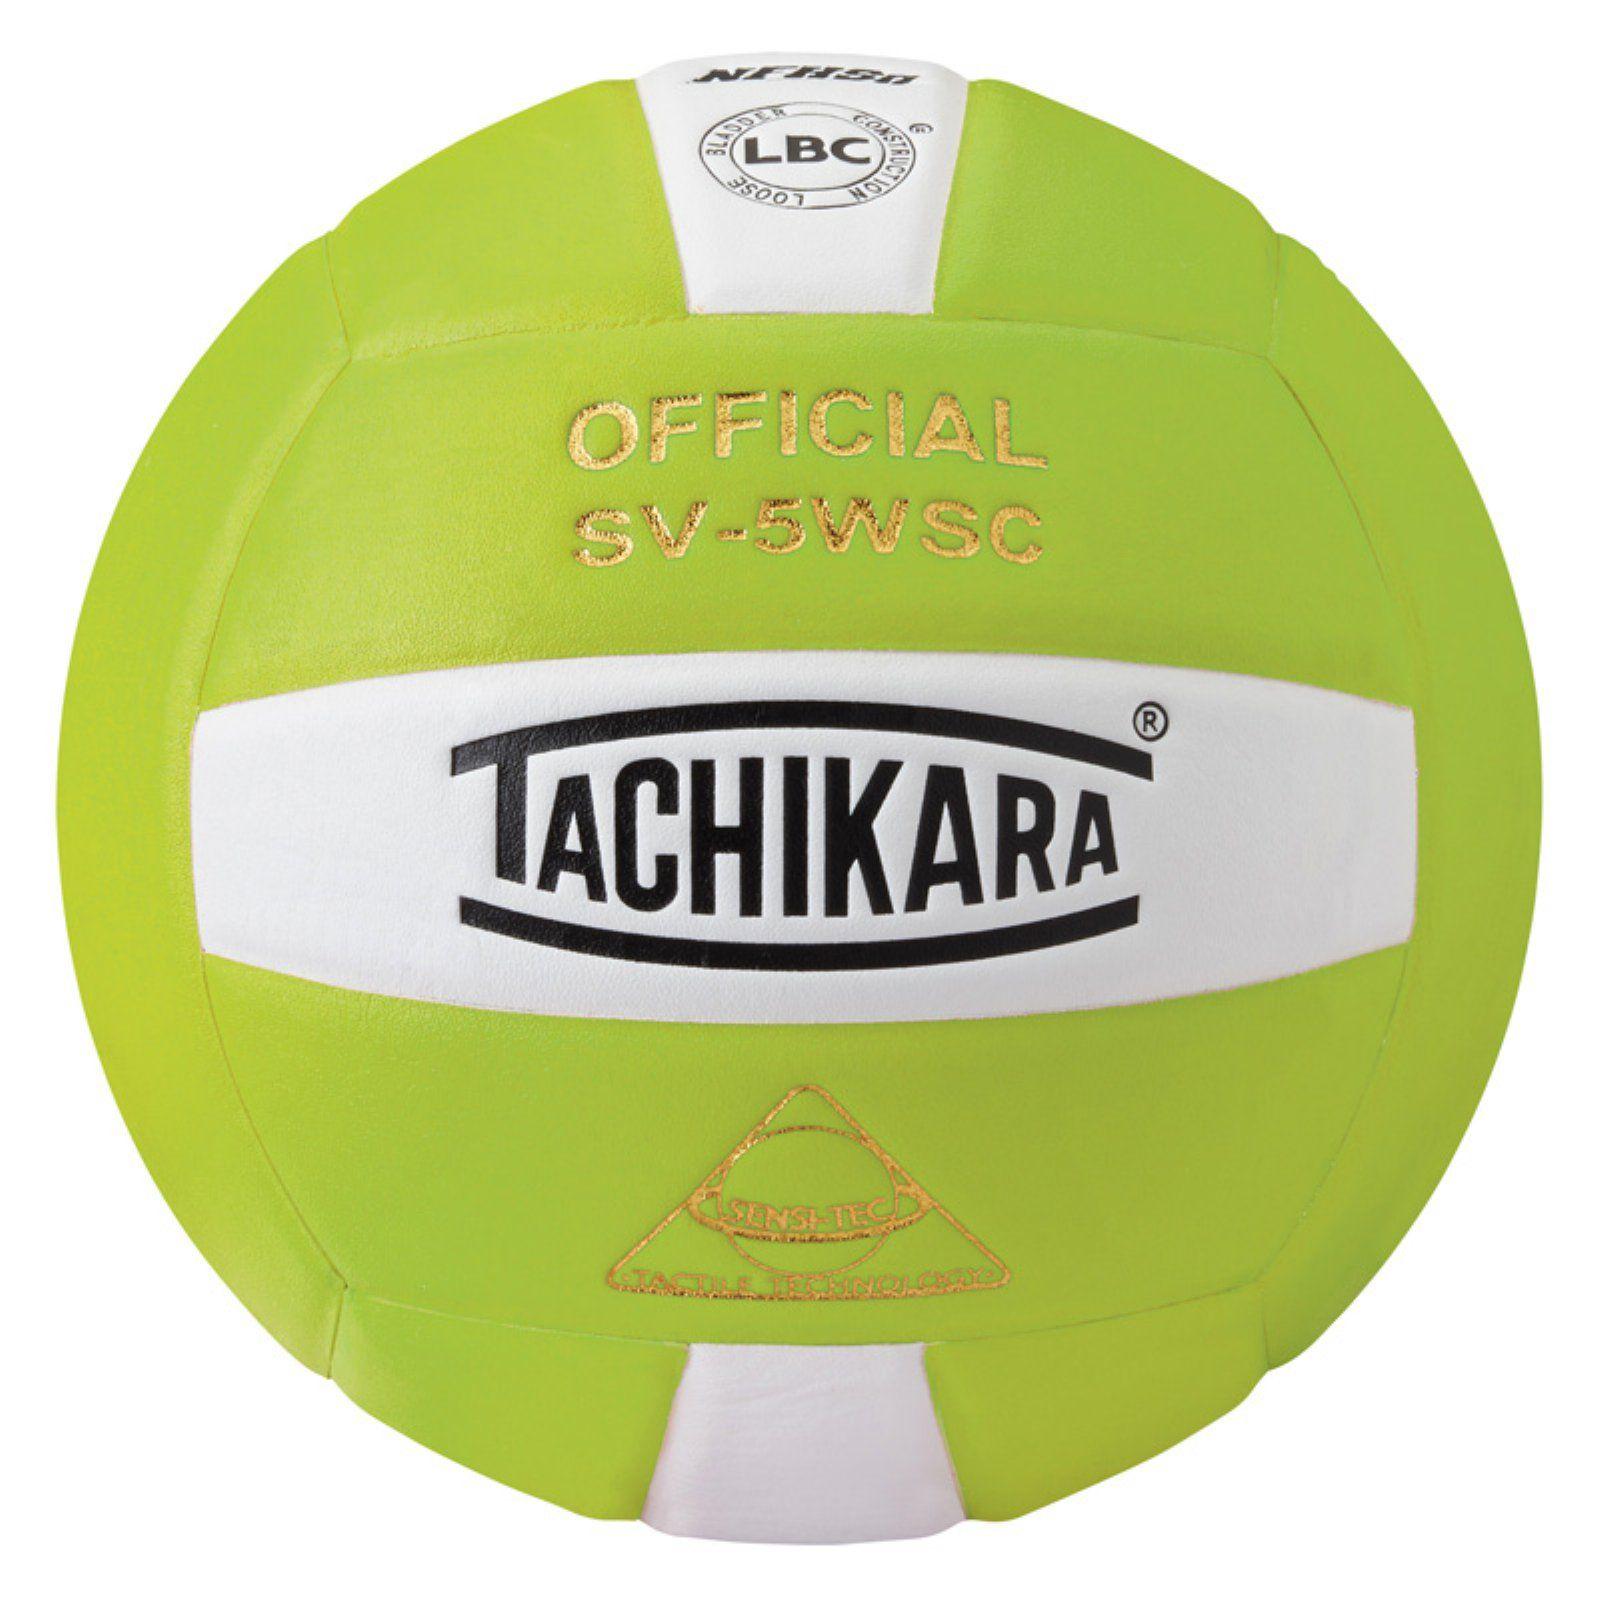 Tachikara Volley Lite Training Volleyball Lime Green White Indoor Volleyball Volleyball Volleyballs